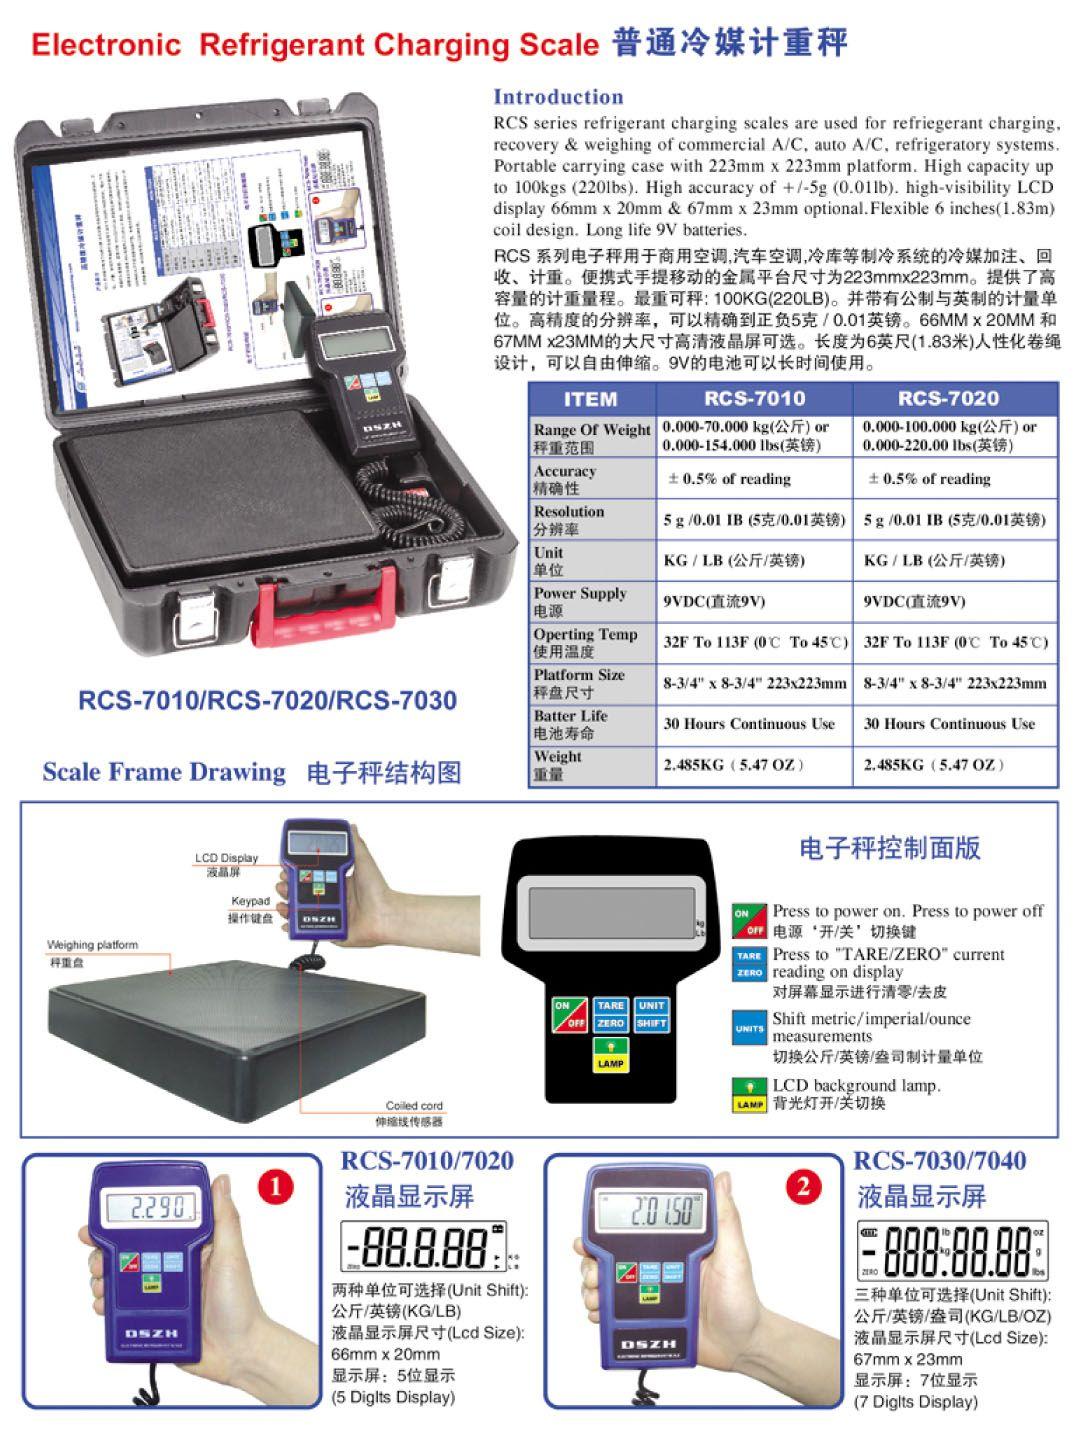 Refrigerant Charging Scale Air conditioner parts, Hvac